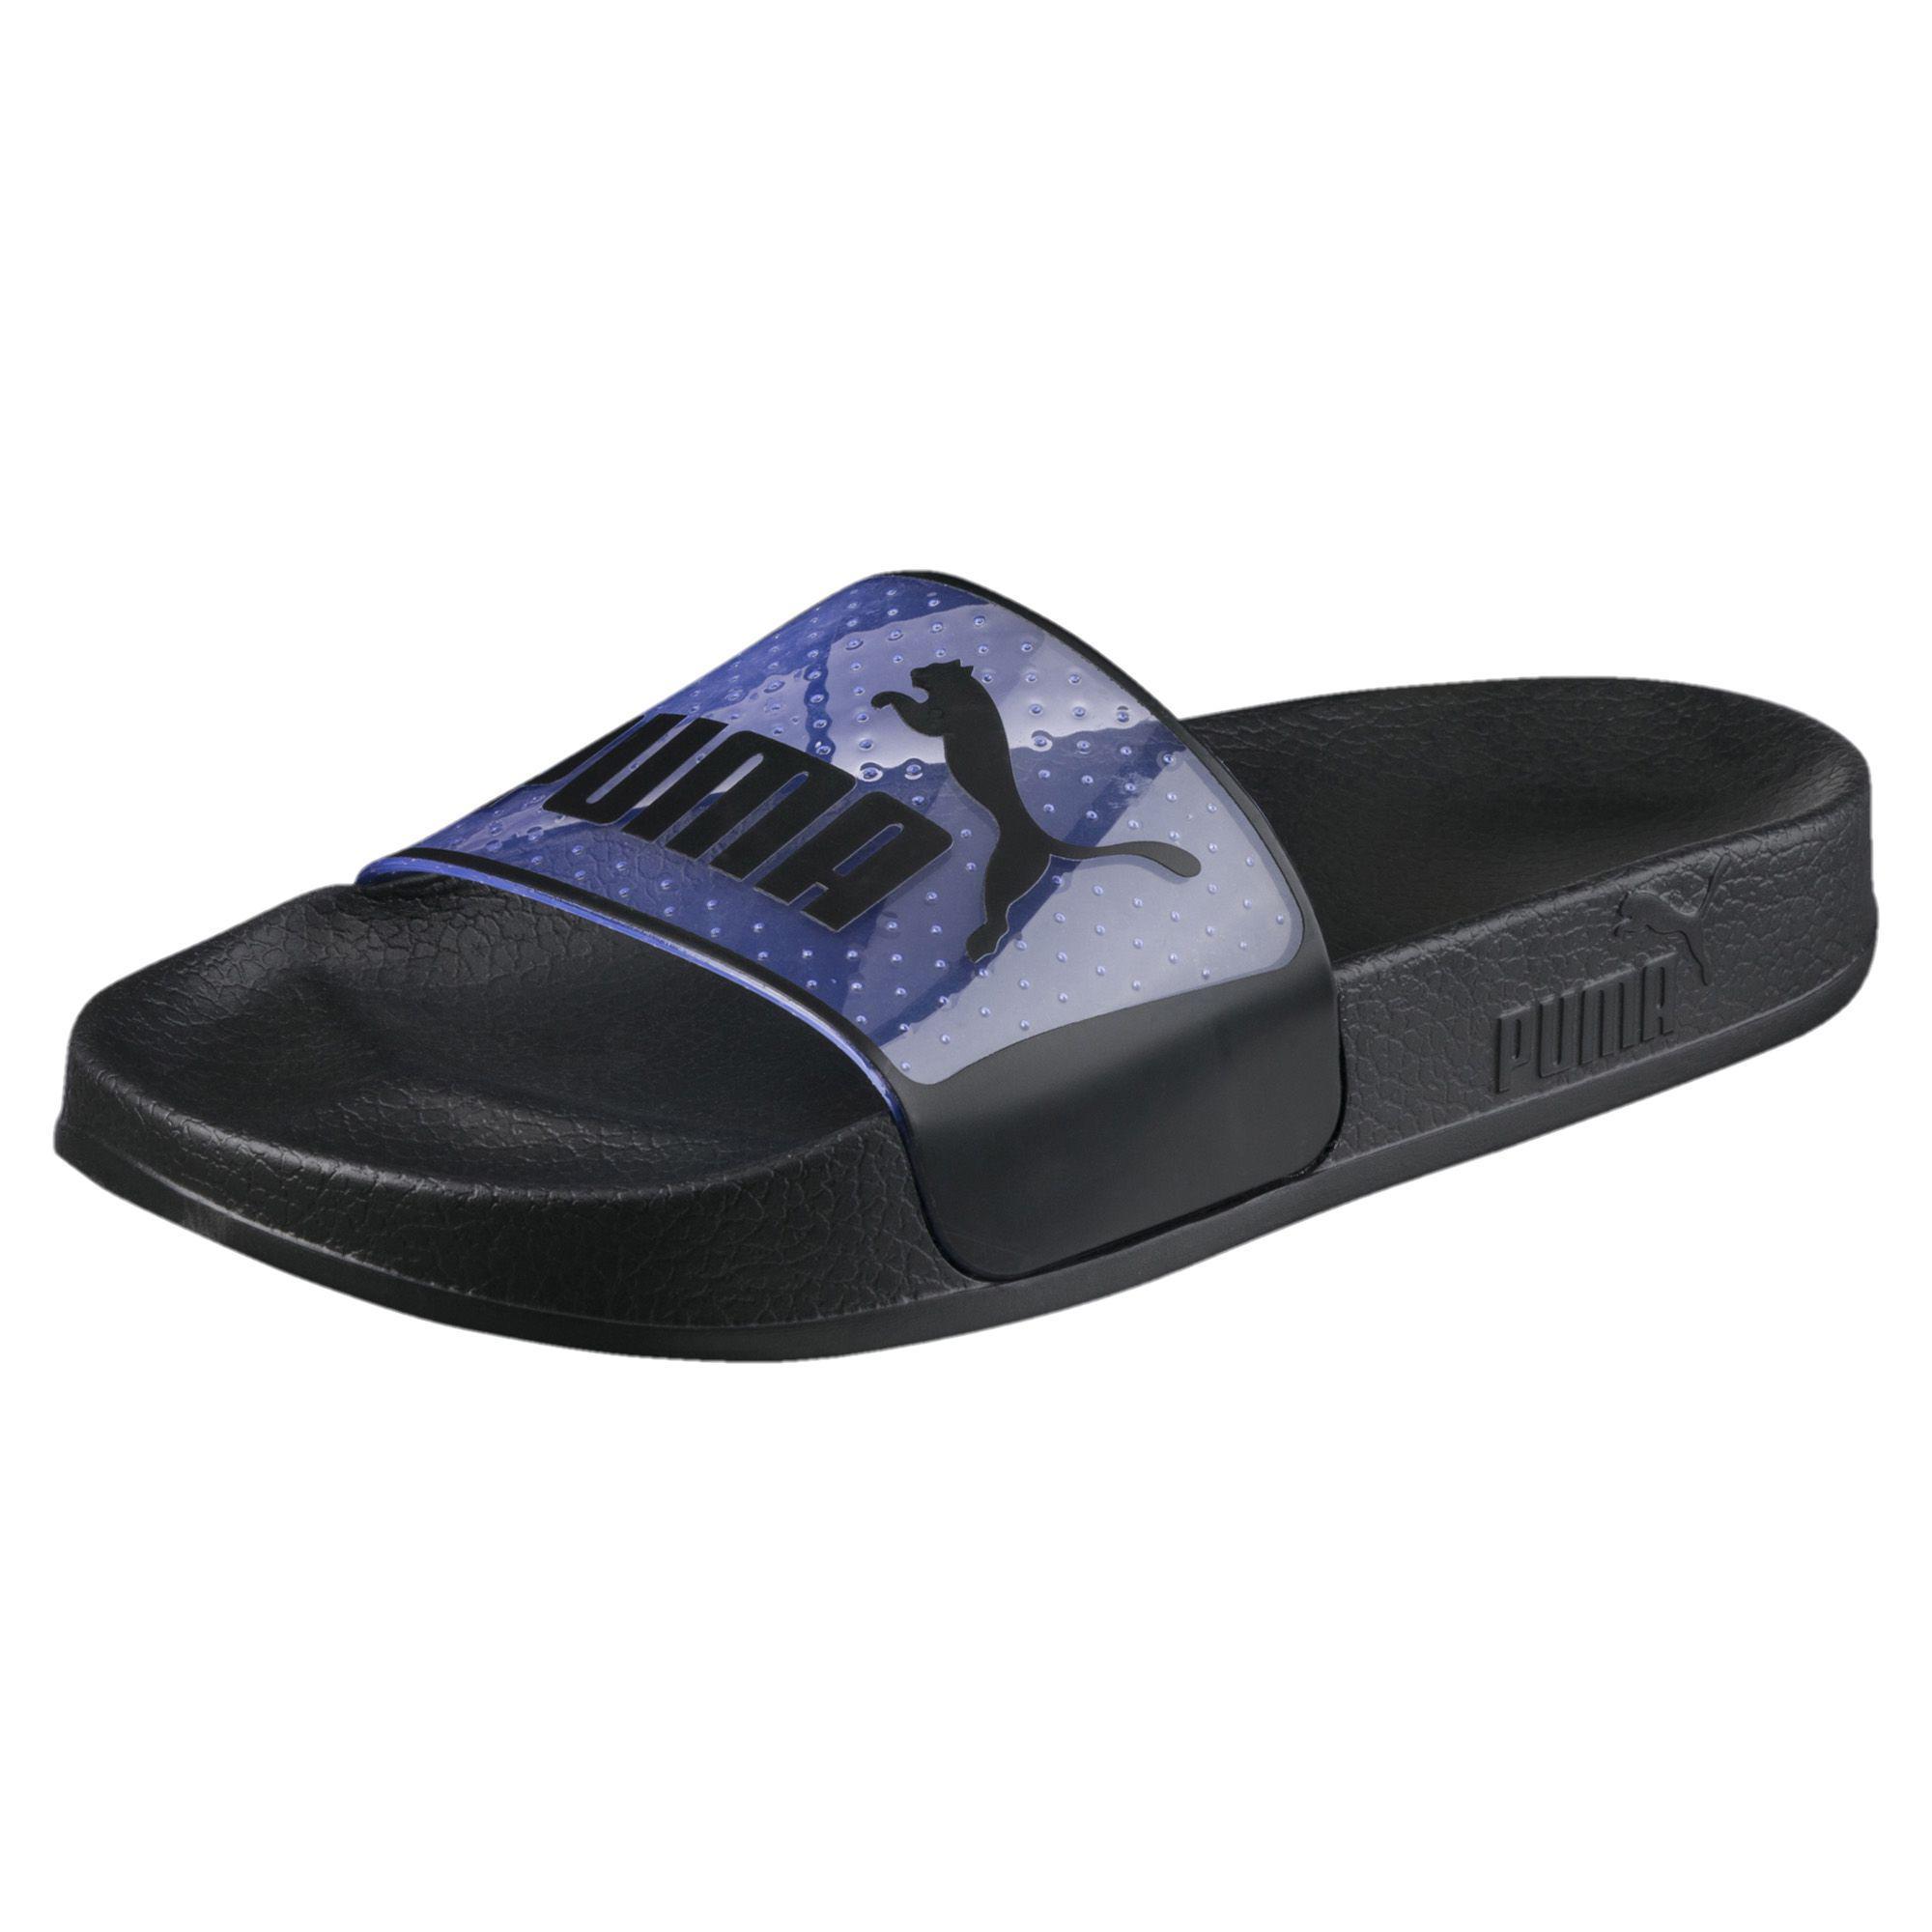 PUMA Synthetic Leadcat Slide Sandal in Blue for Men - Lyst